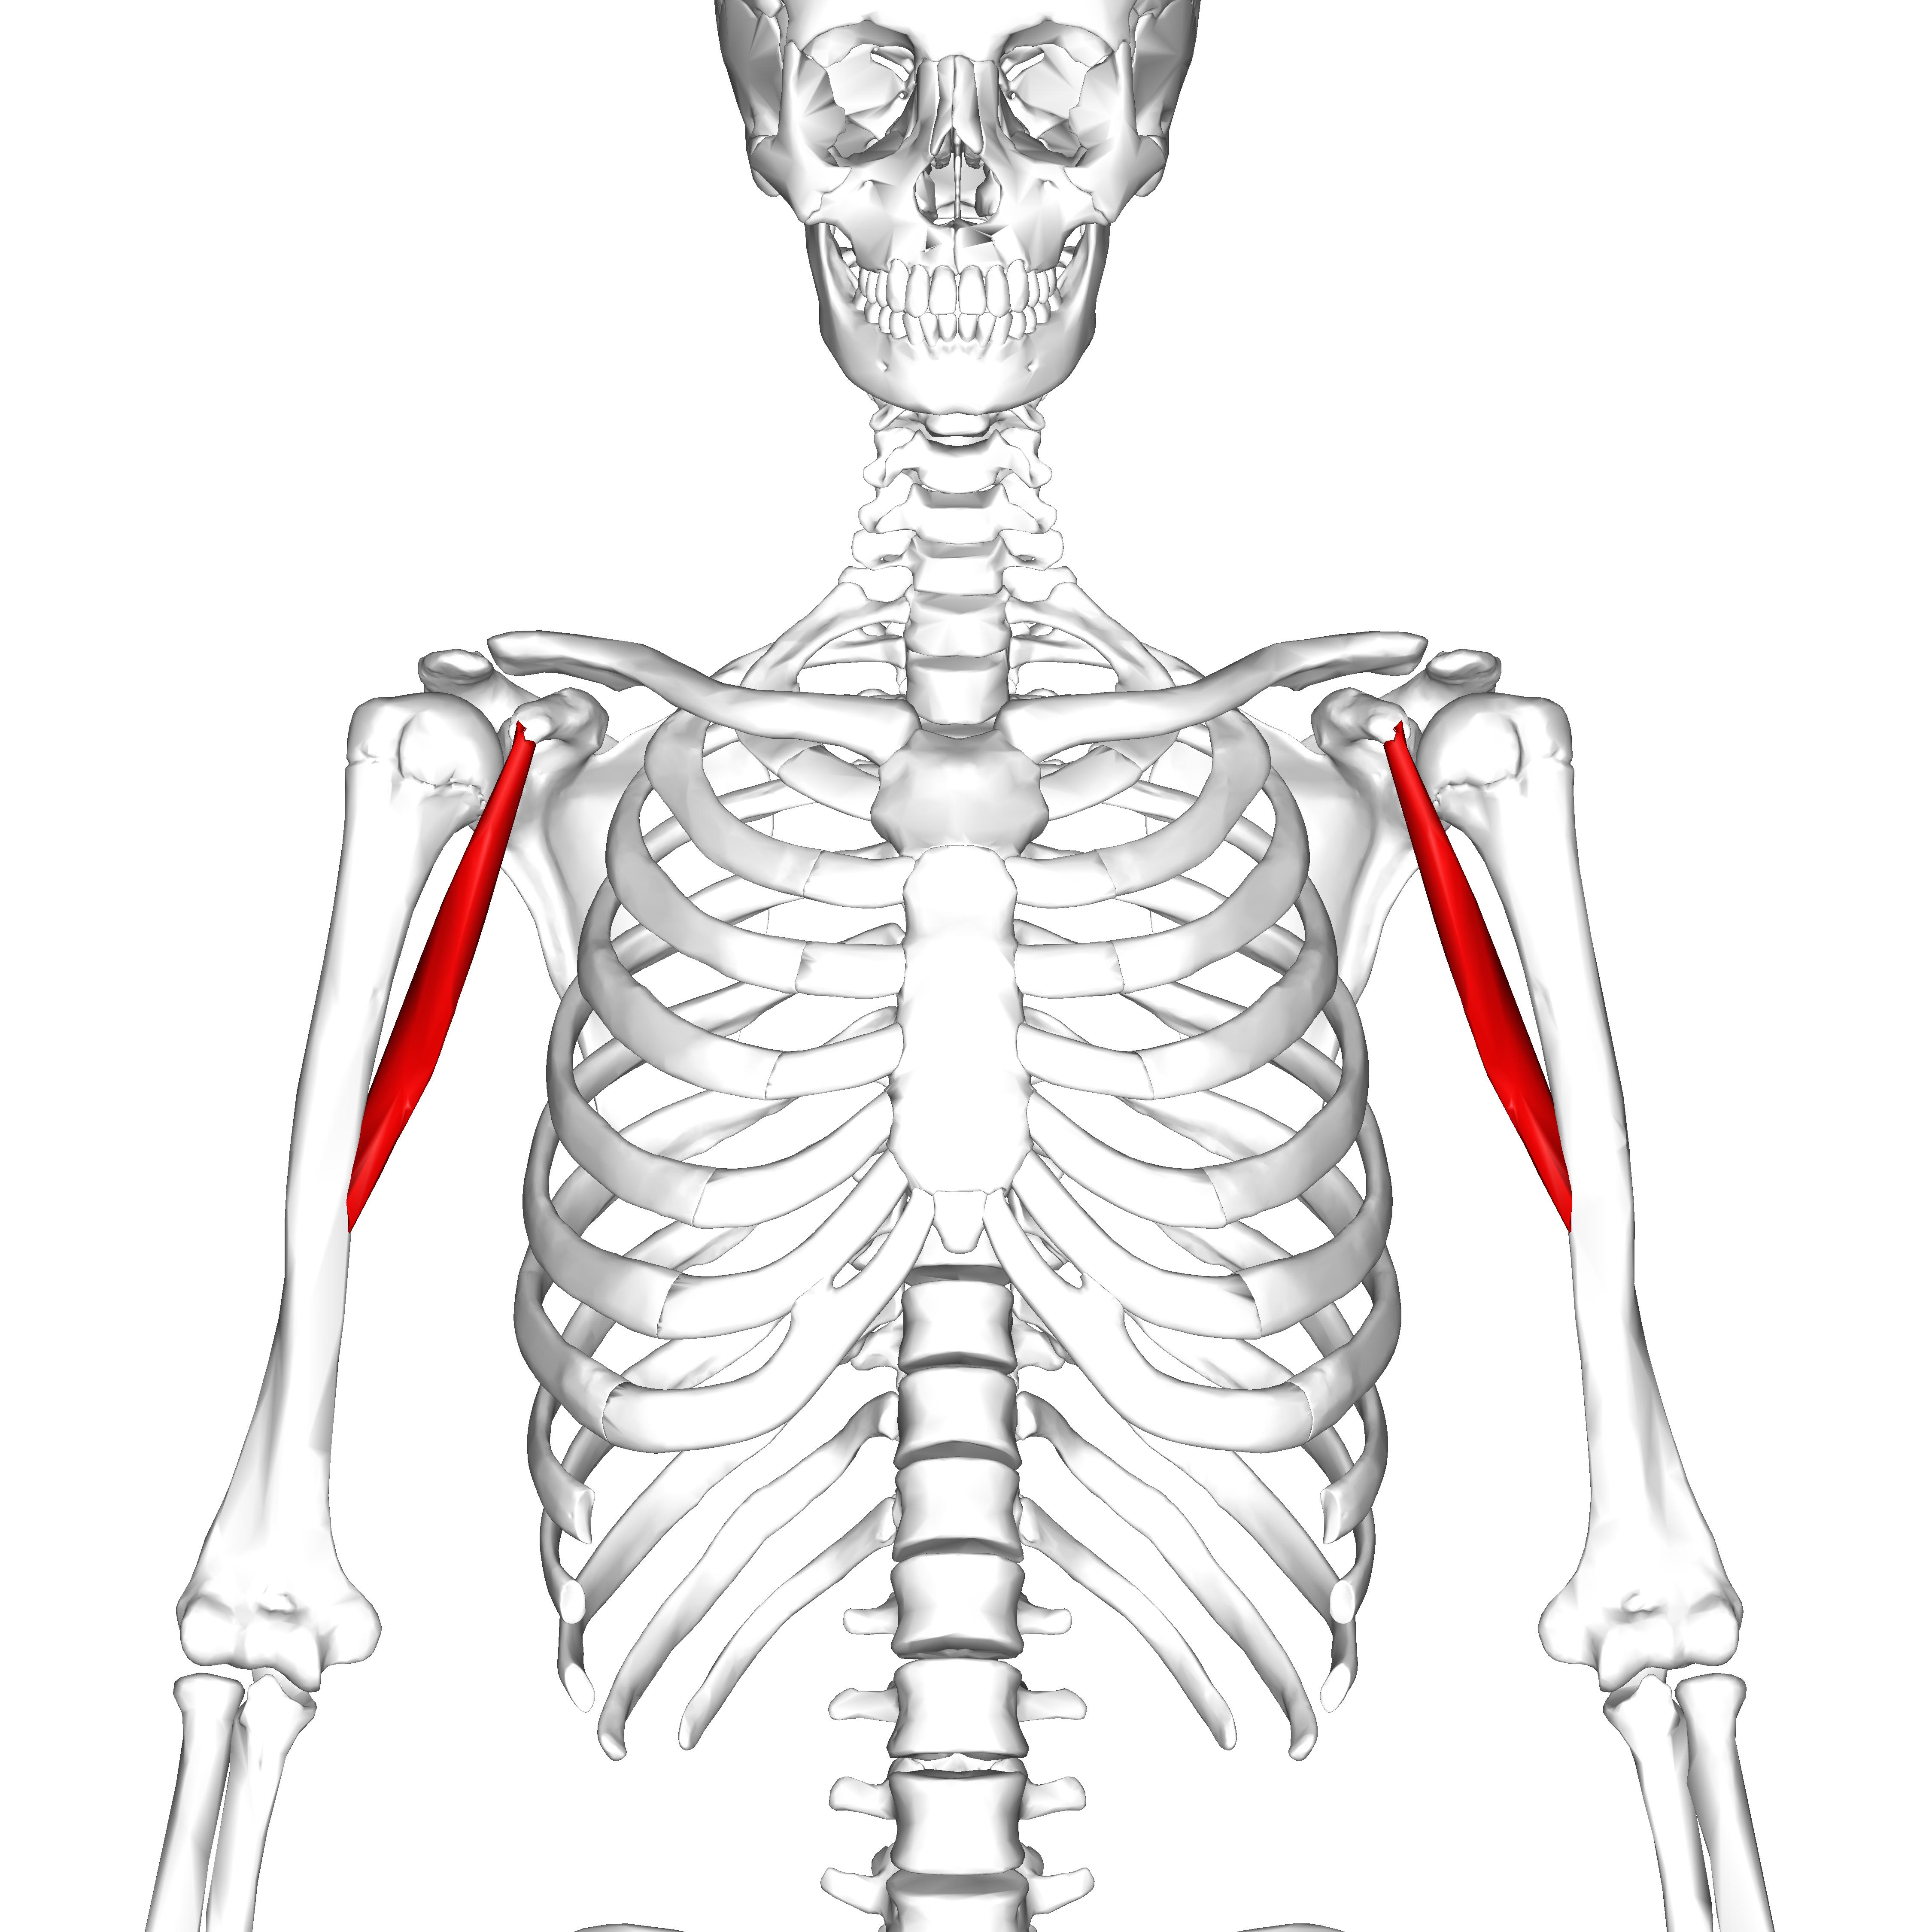 File:Coracobrachialis muscle05.png - Wikimedia Commons